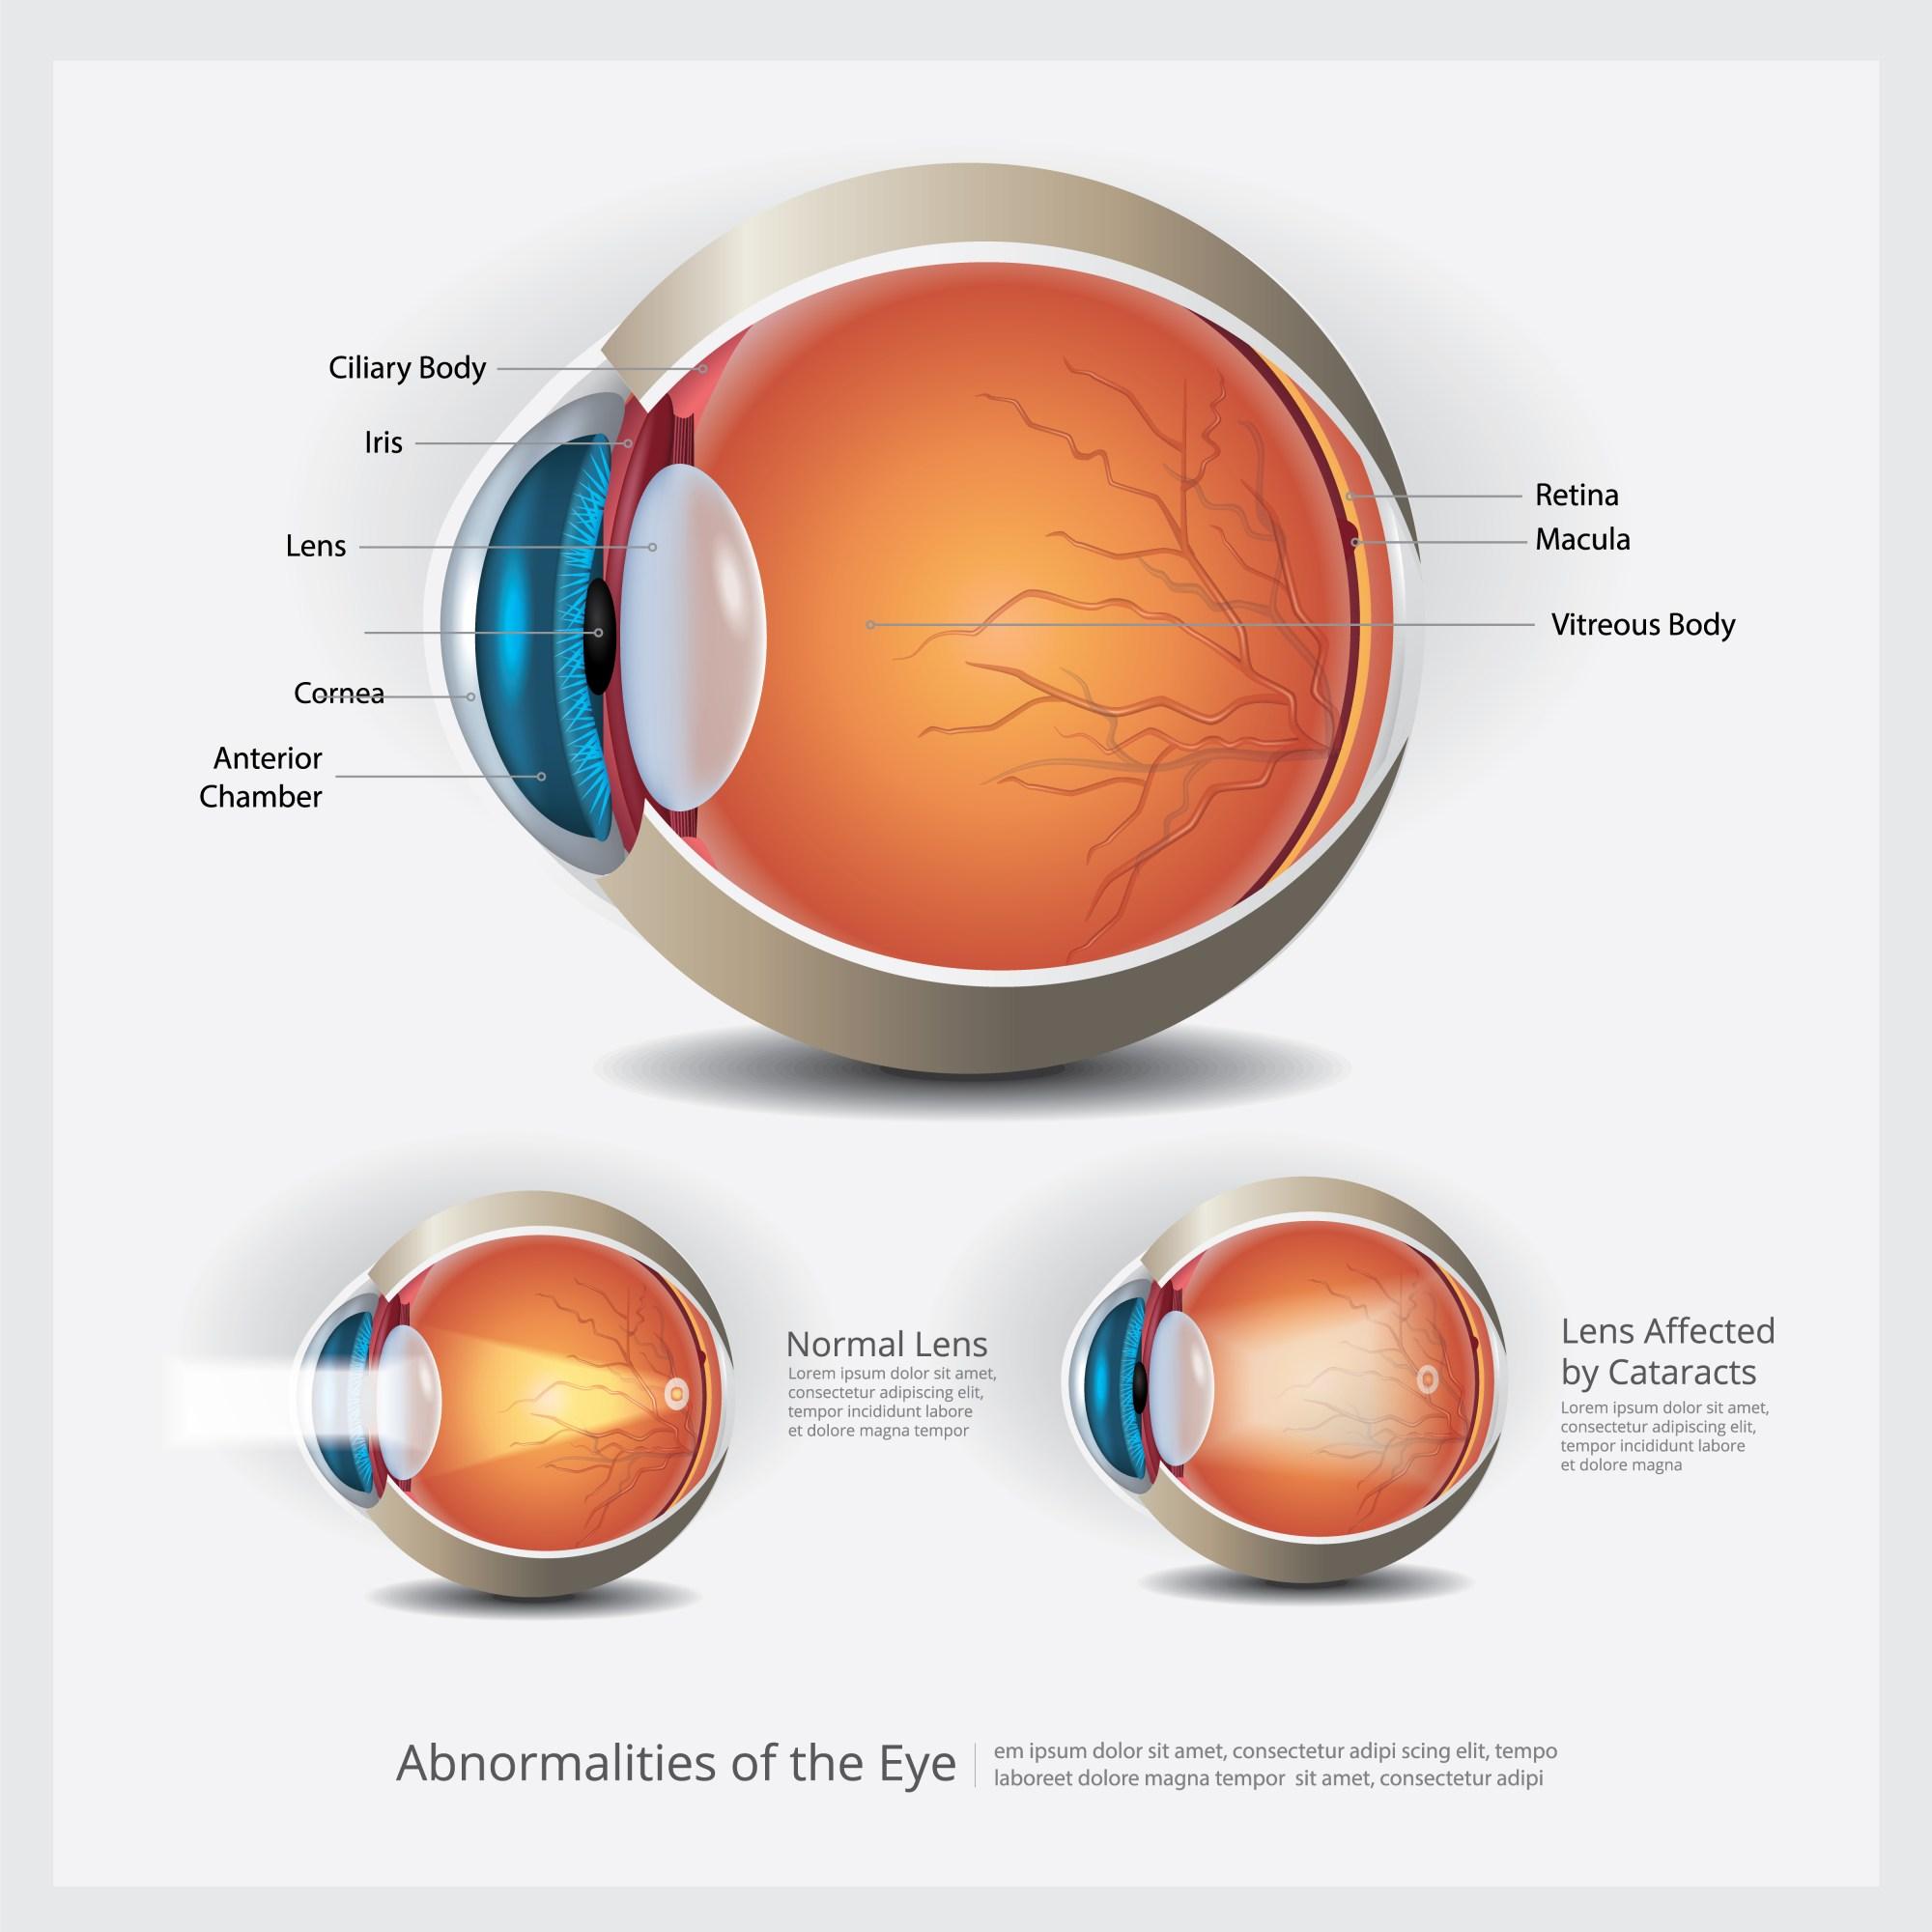 hight resolution of eye anatomy with eye abnormalities vector illustration